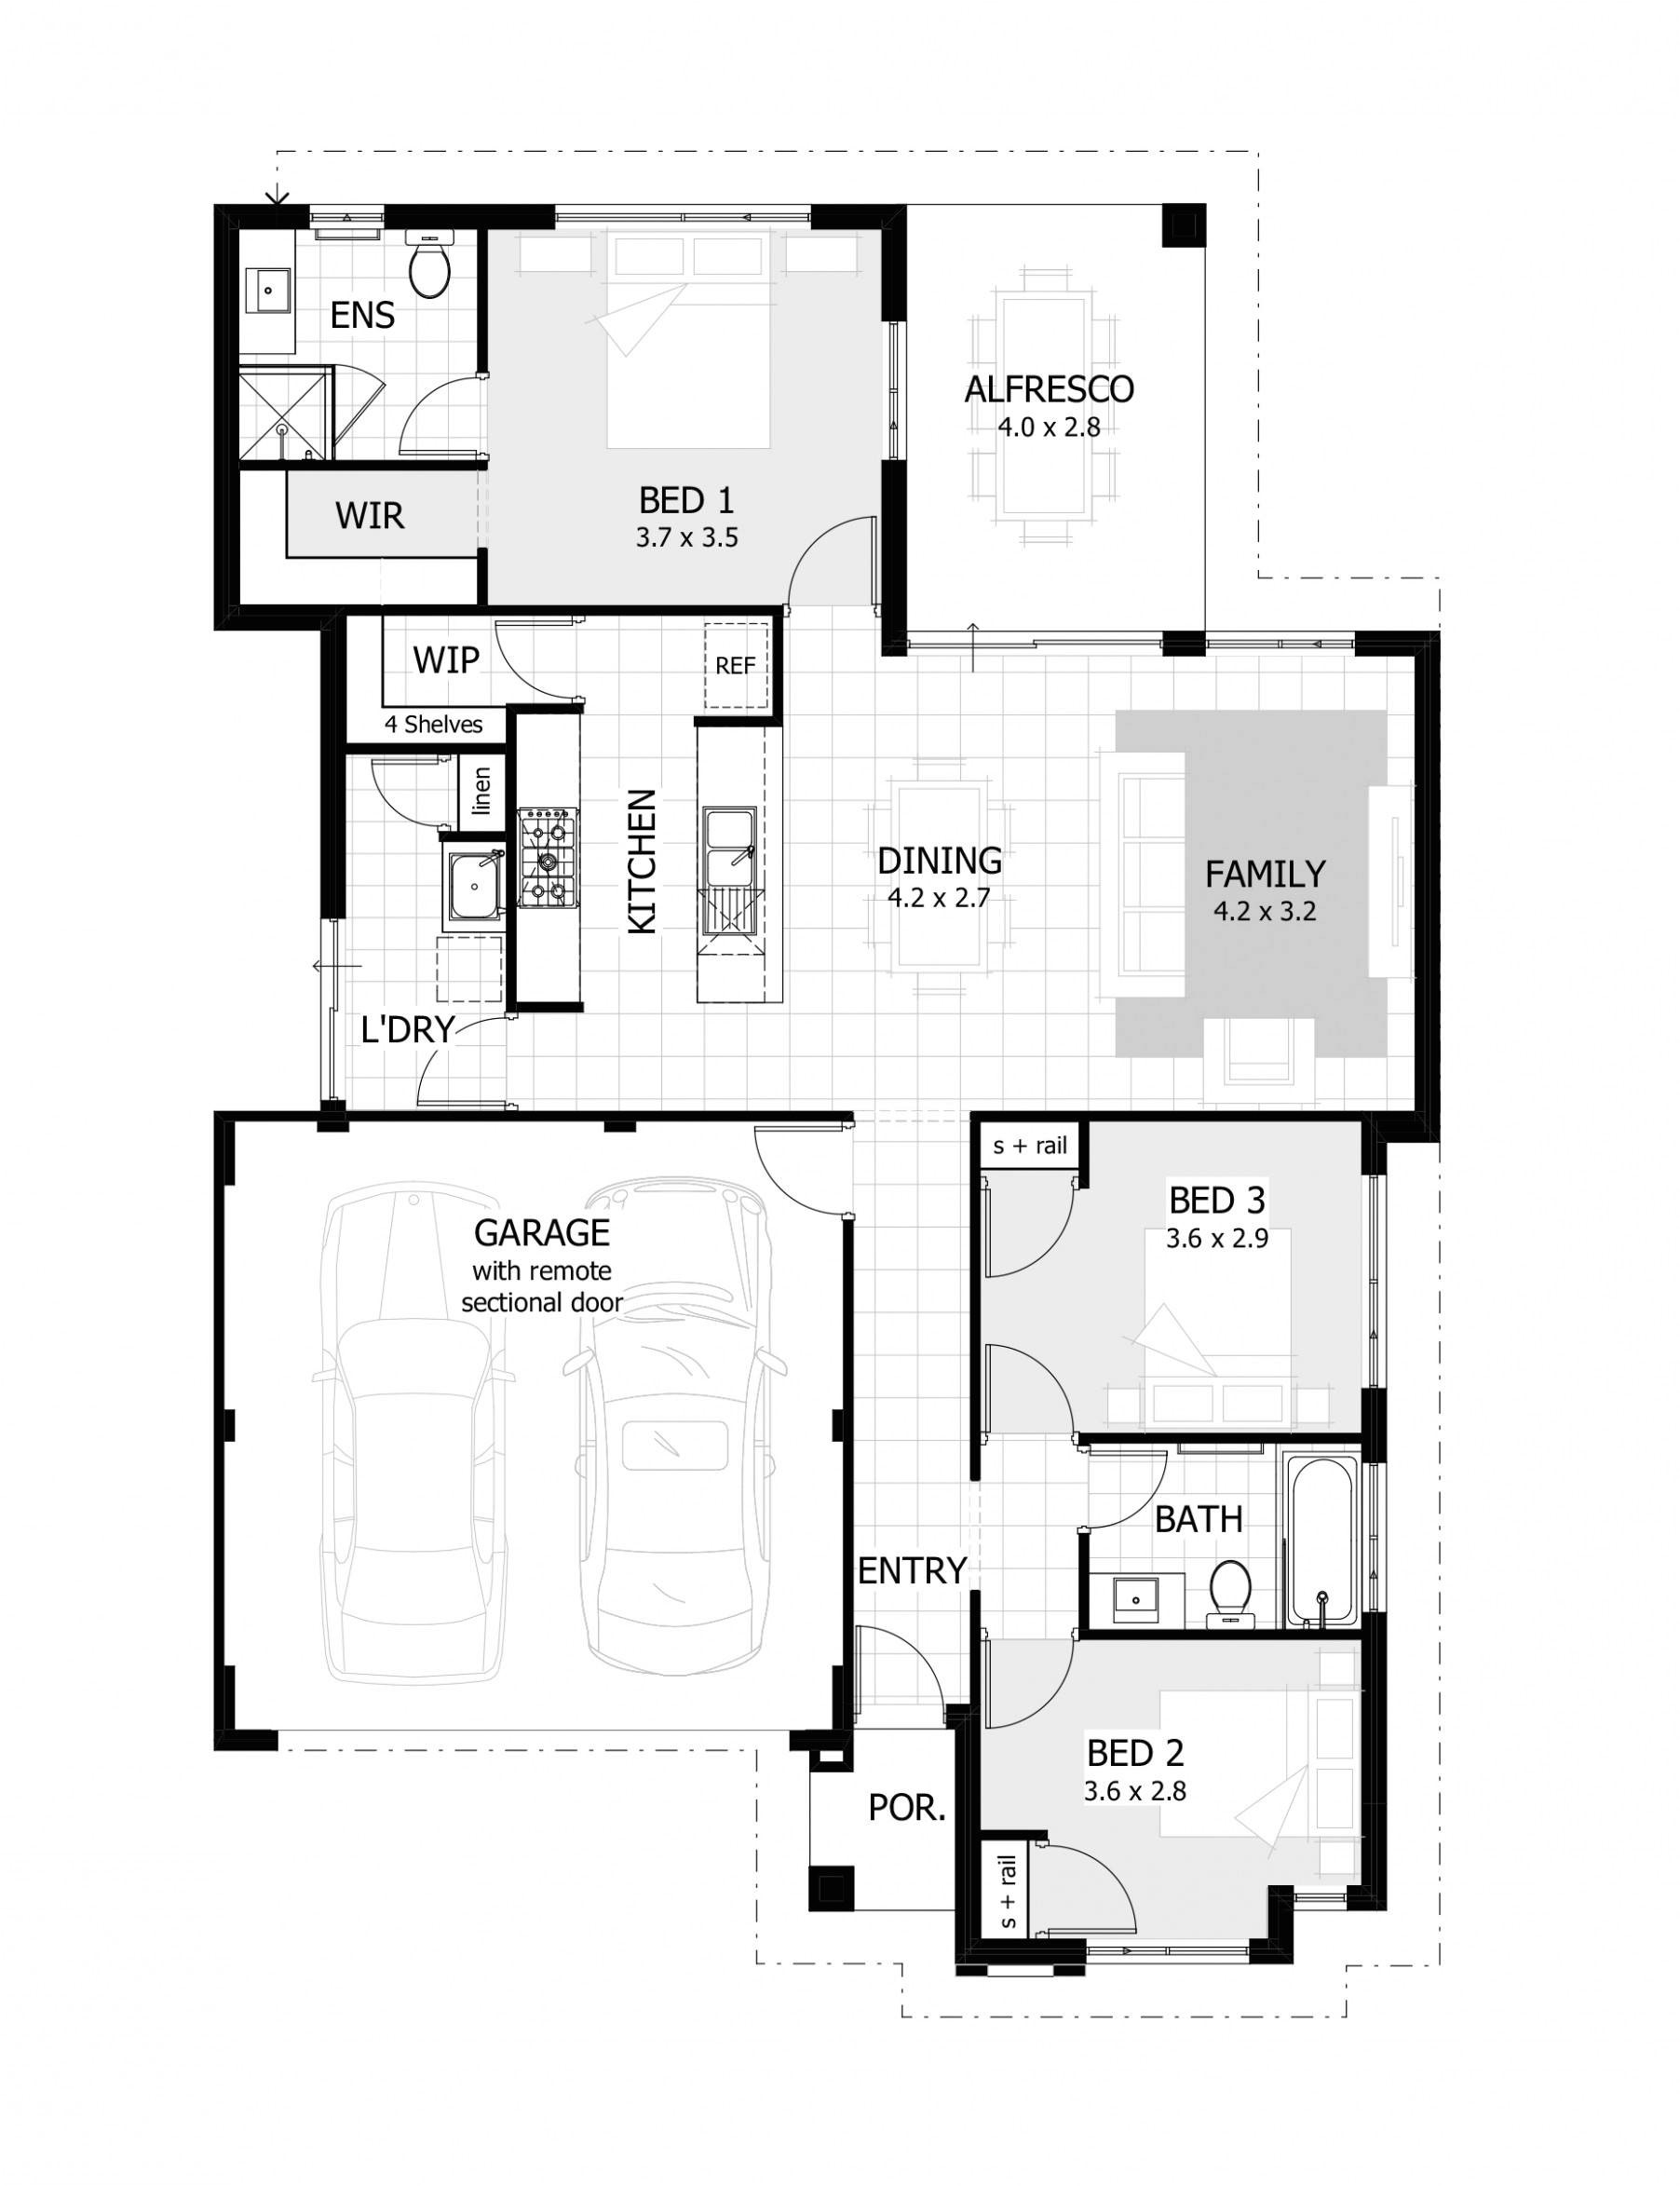 single family home plans elegant 45 unique free single family home floor plans house floor plans